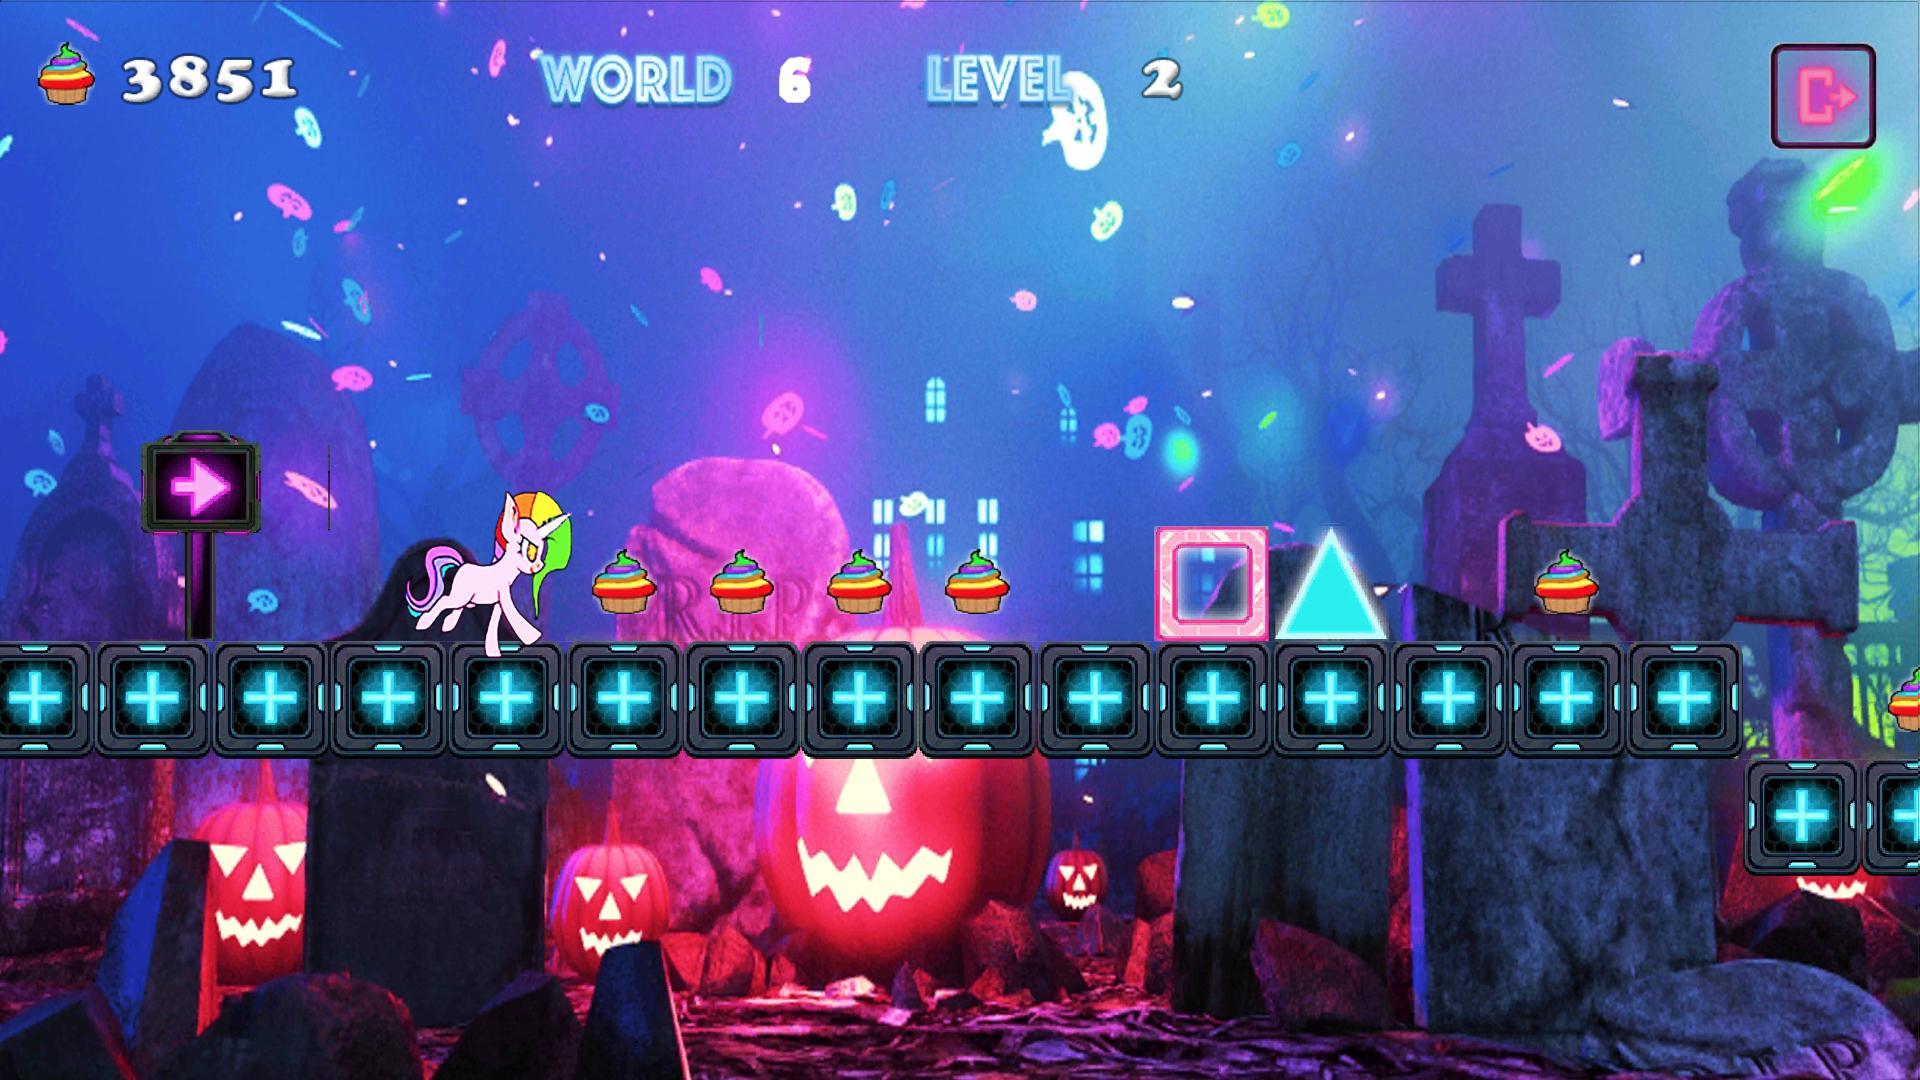 Unicorn Dash Neon Lights Unicorn Games mlp games 2.8.105 Screenshot 6